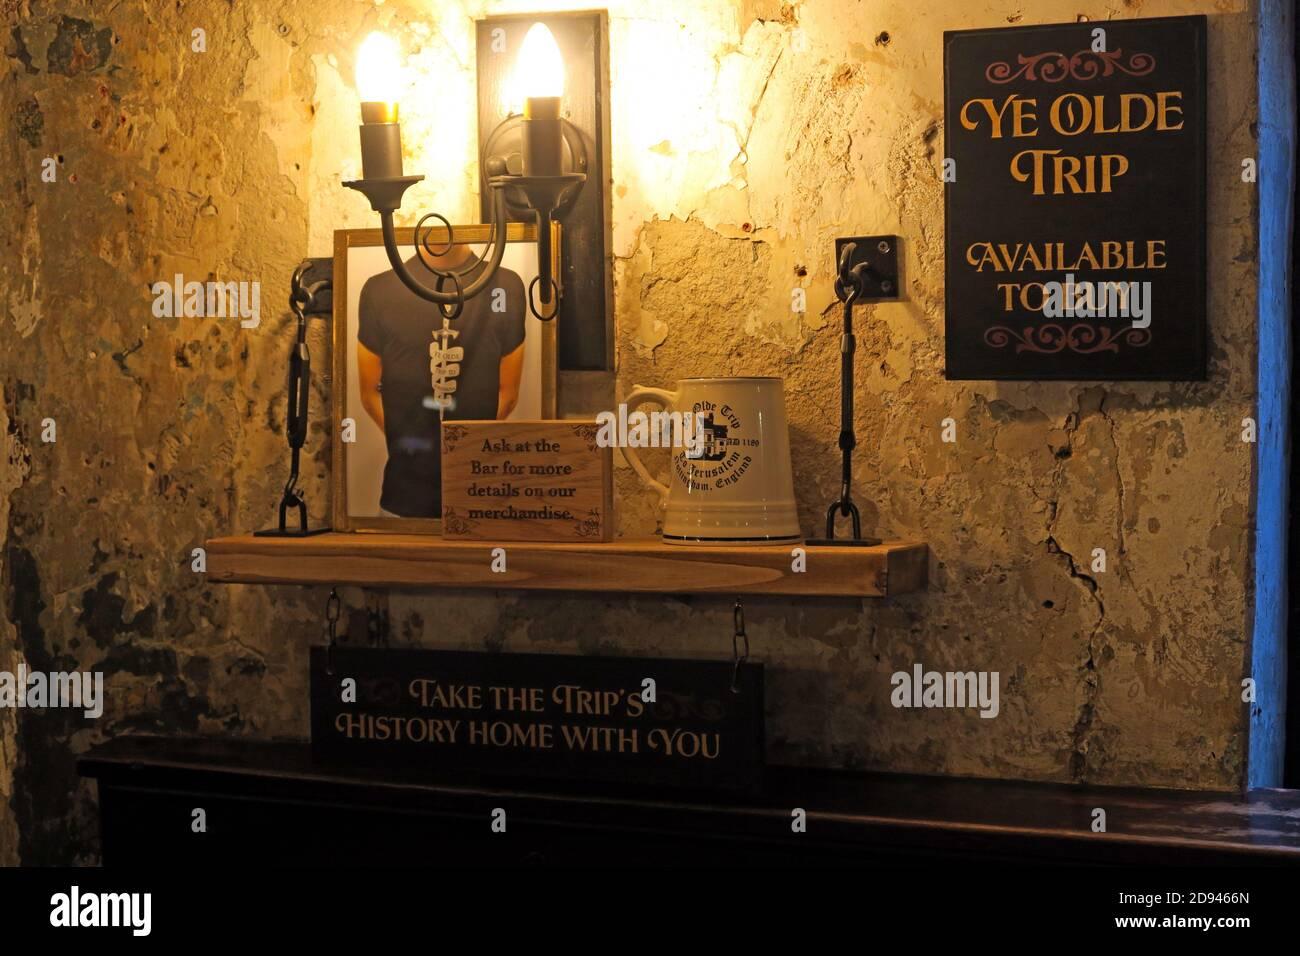 HotpixUK,@HotpixUK,GoTonySmith,UK,England,Great Britain,GB,Nottingham,pub,bar,CAMRA,listed building,oldest bar,old,historic,dusk,evening,sign,city centre,Nottinghamshire,Nottingham city centre,Notts,NG1,east Midlands,Oldest Inn In England,medieval,historic building,1189,Castle Rock,Nottingham Castle,brewhouse,1799,The Pilgrim,the Trip,Brew House Yard,Nottingham Castle Brewhouse,pub sign,gifts,merchandise,inside